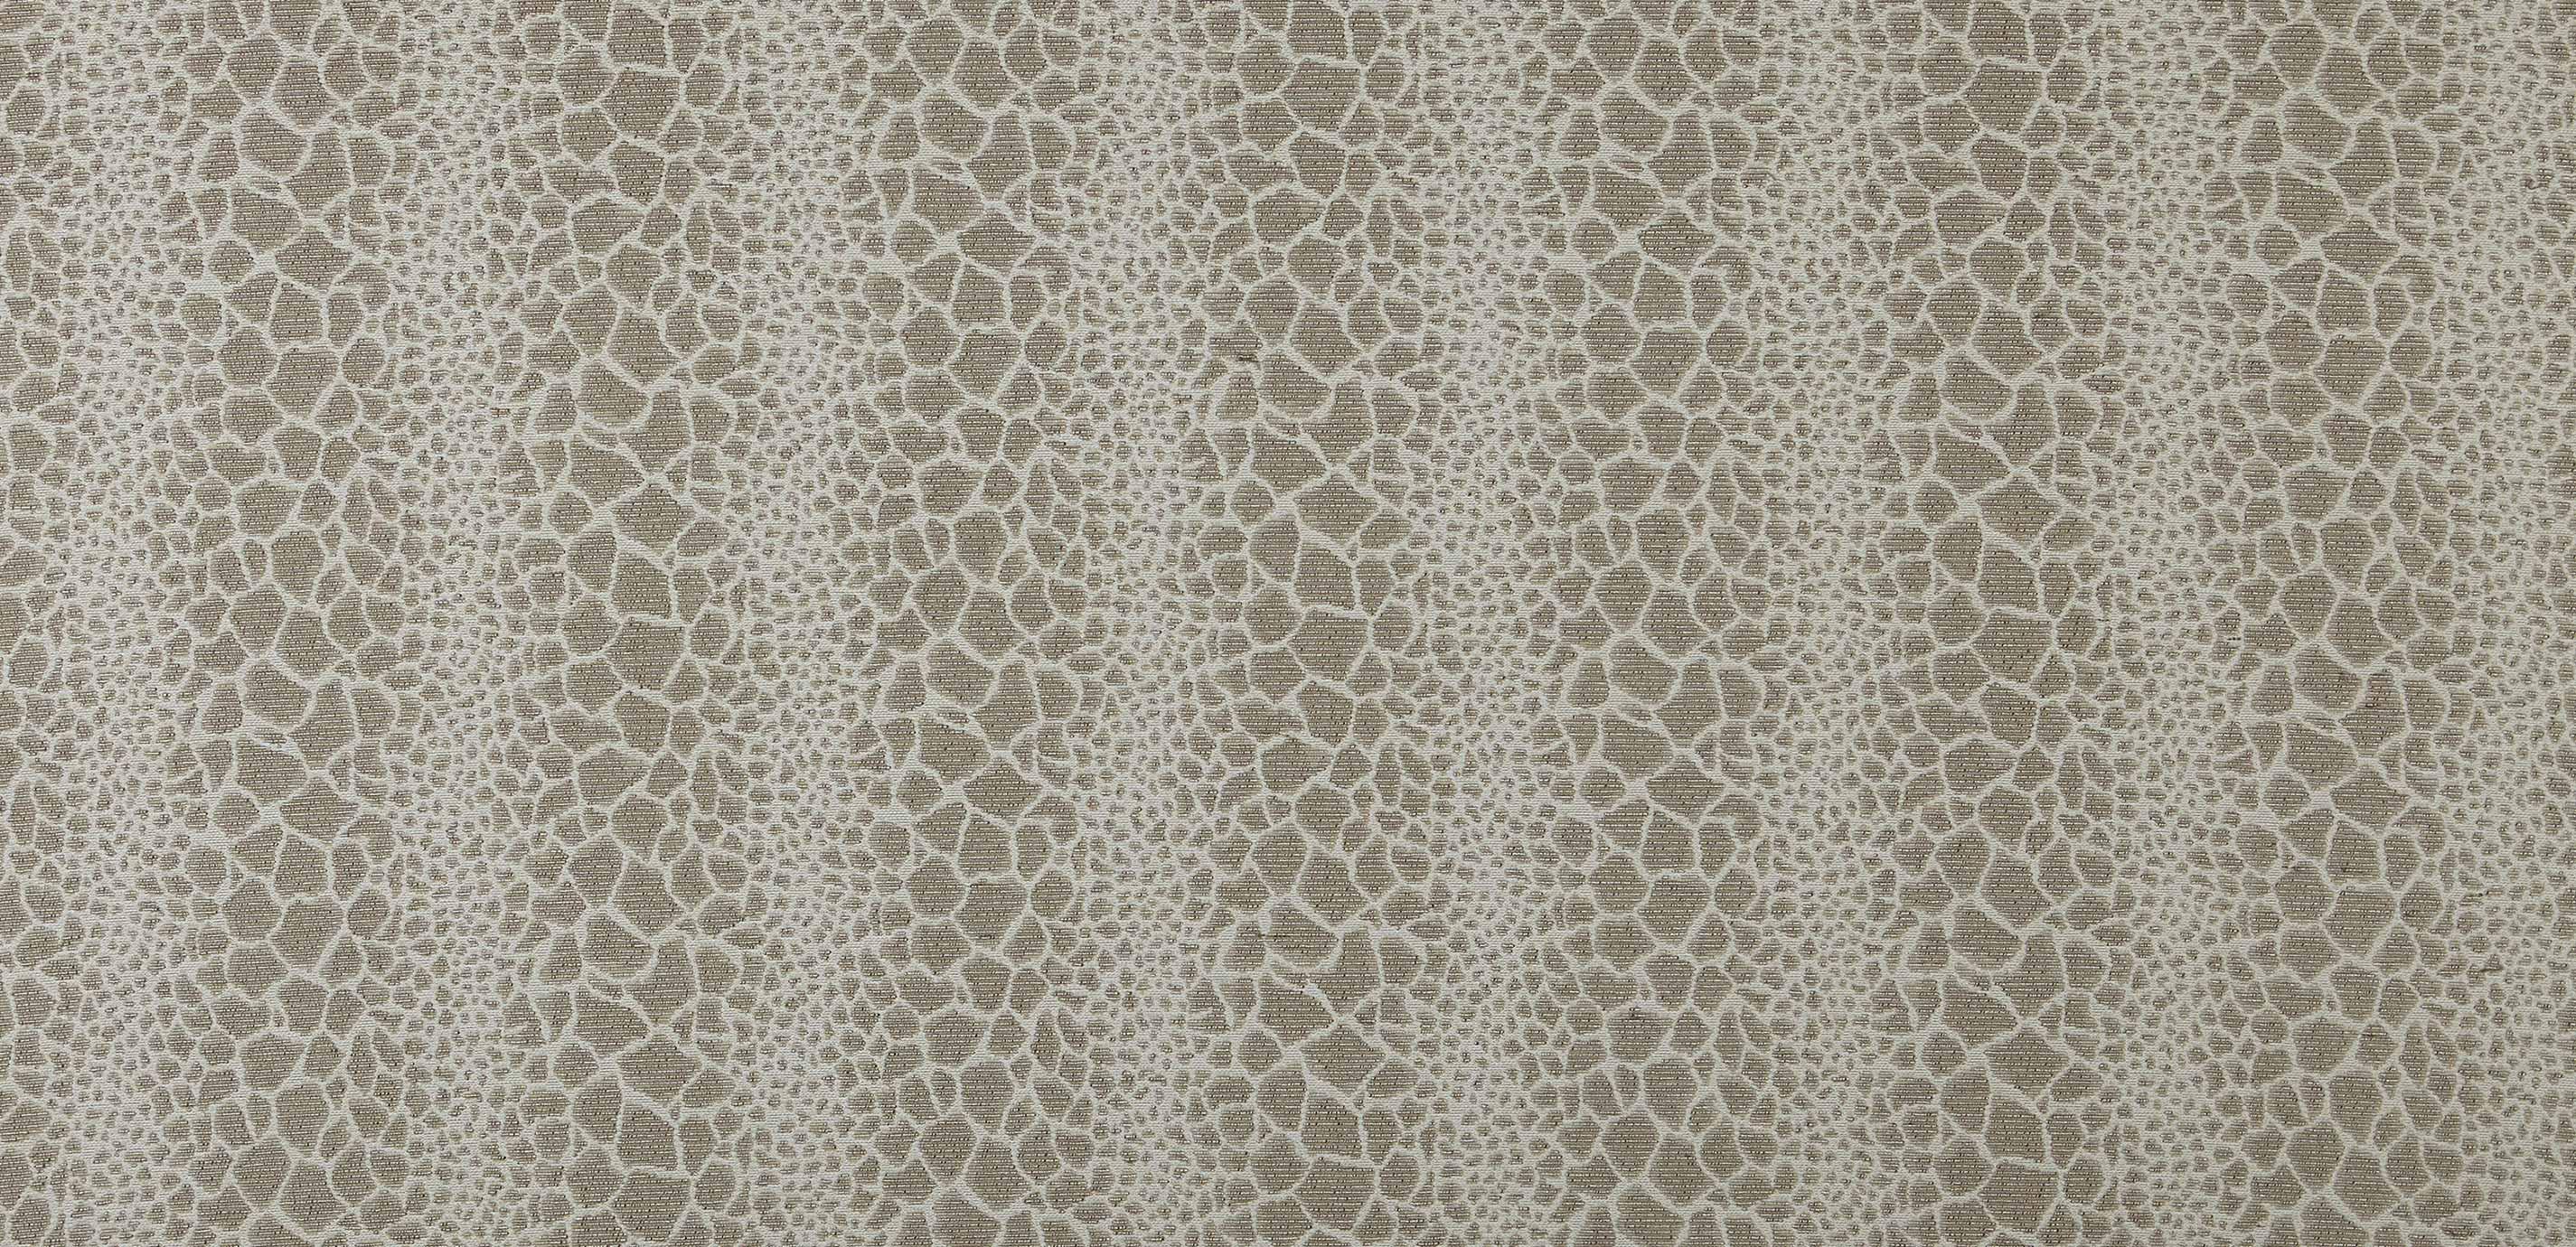 Niasse Pebble Fabrics Ethan Allen